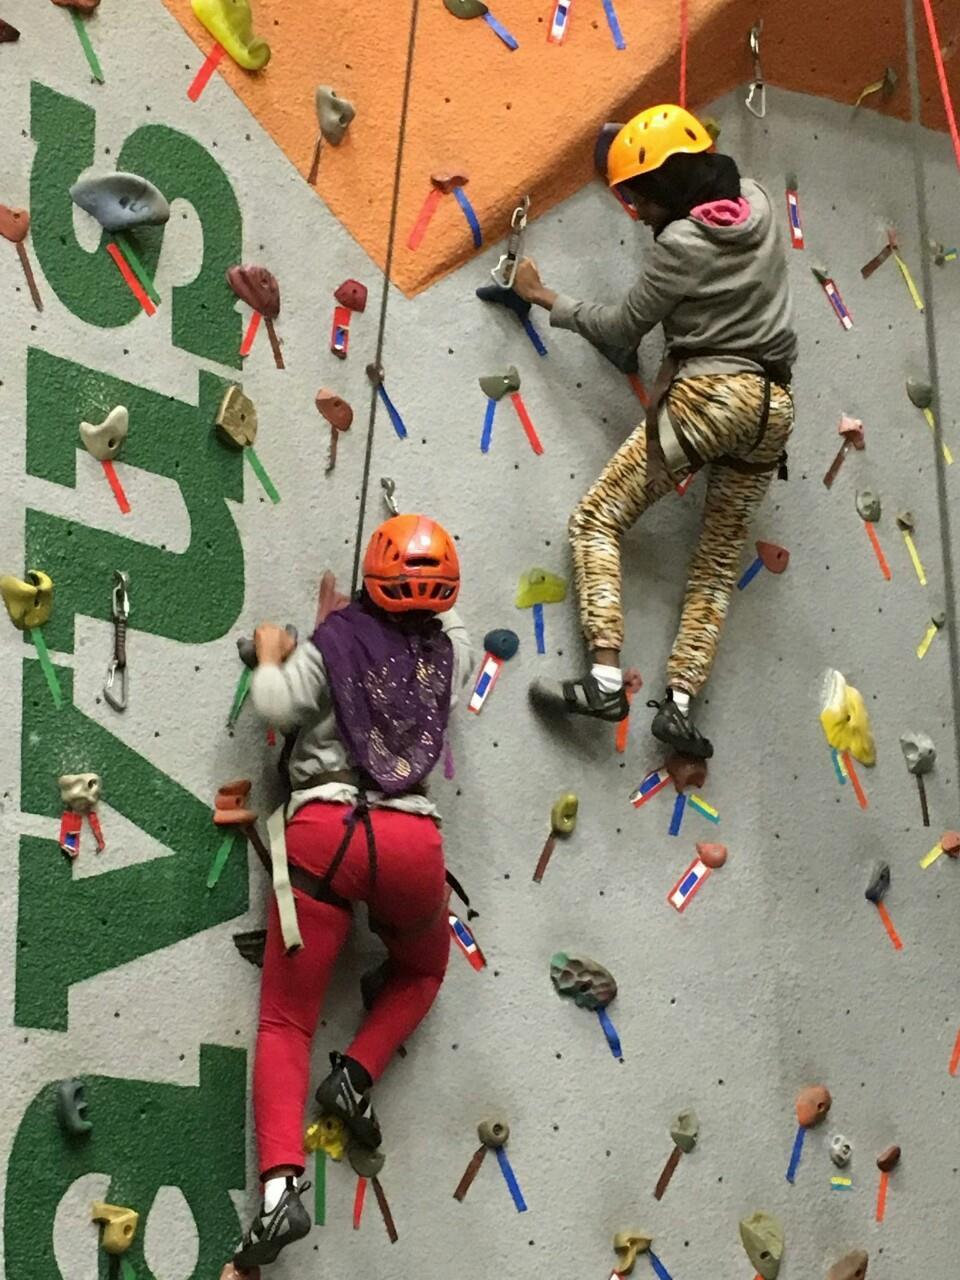 Photo.Climbing Wall - Jenn Carter.jpg